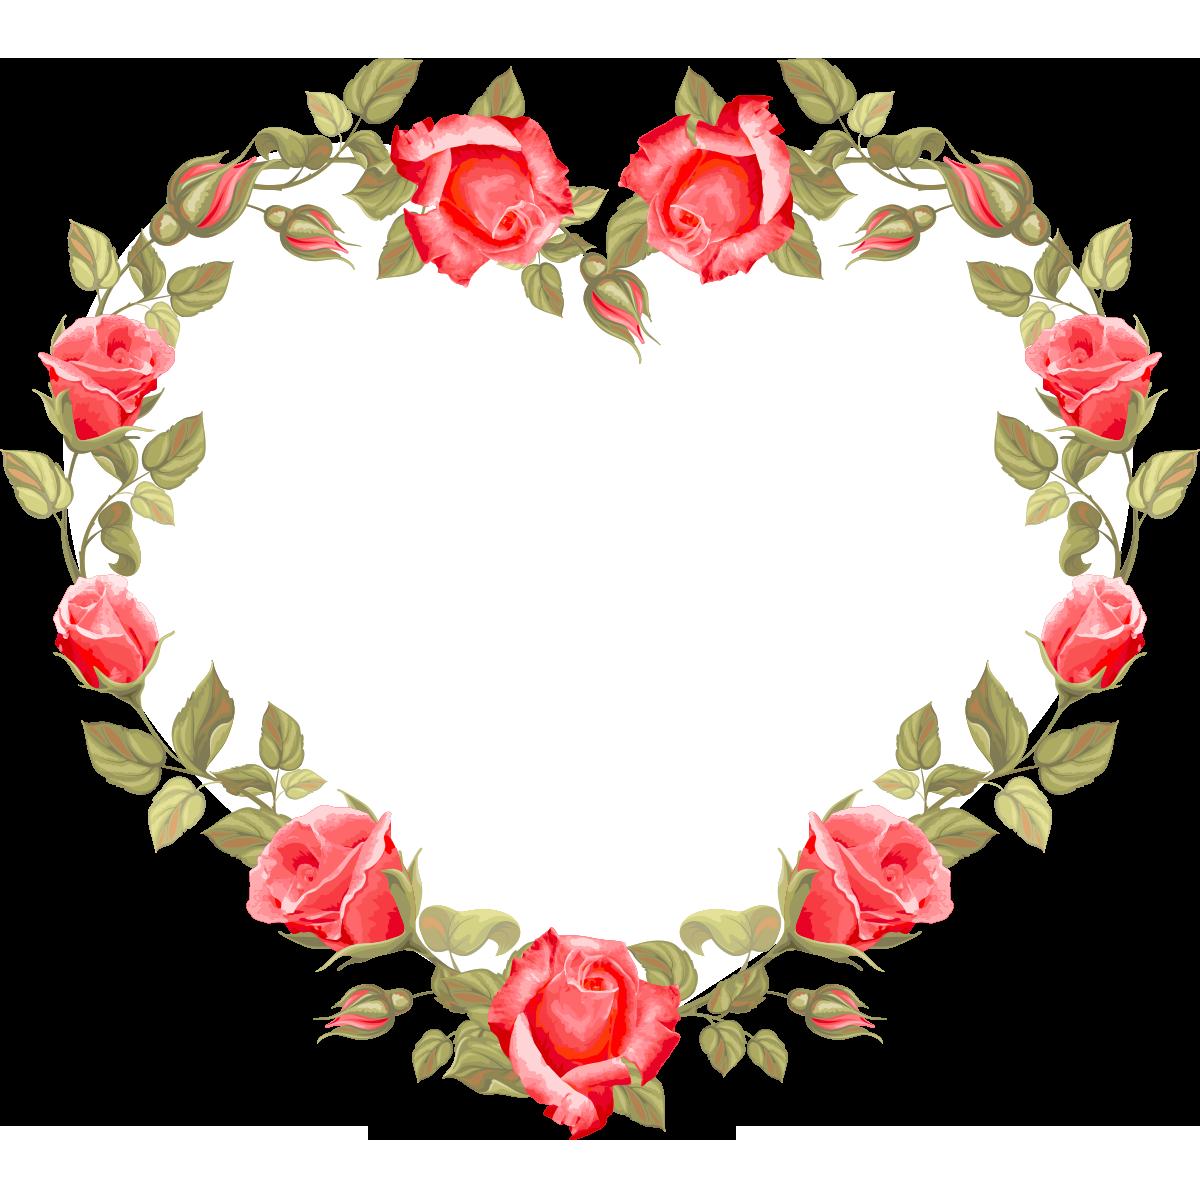 Wedding invitation Flower Heart Clip art - Love roses ring 1200*1200 ... svg free